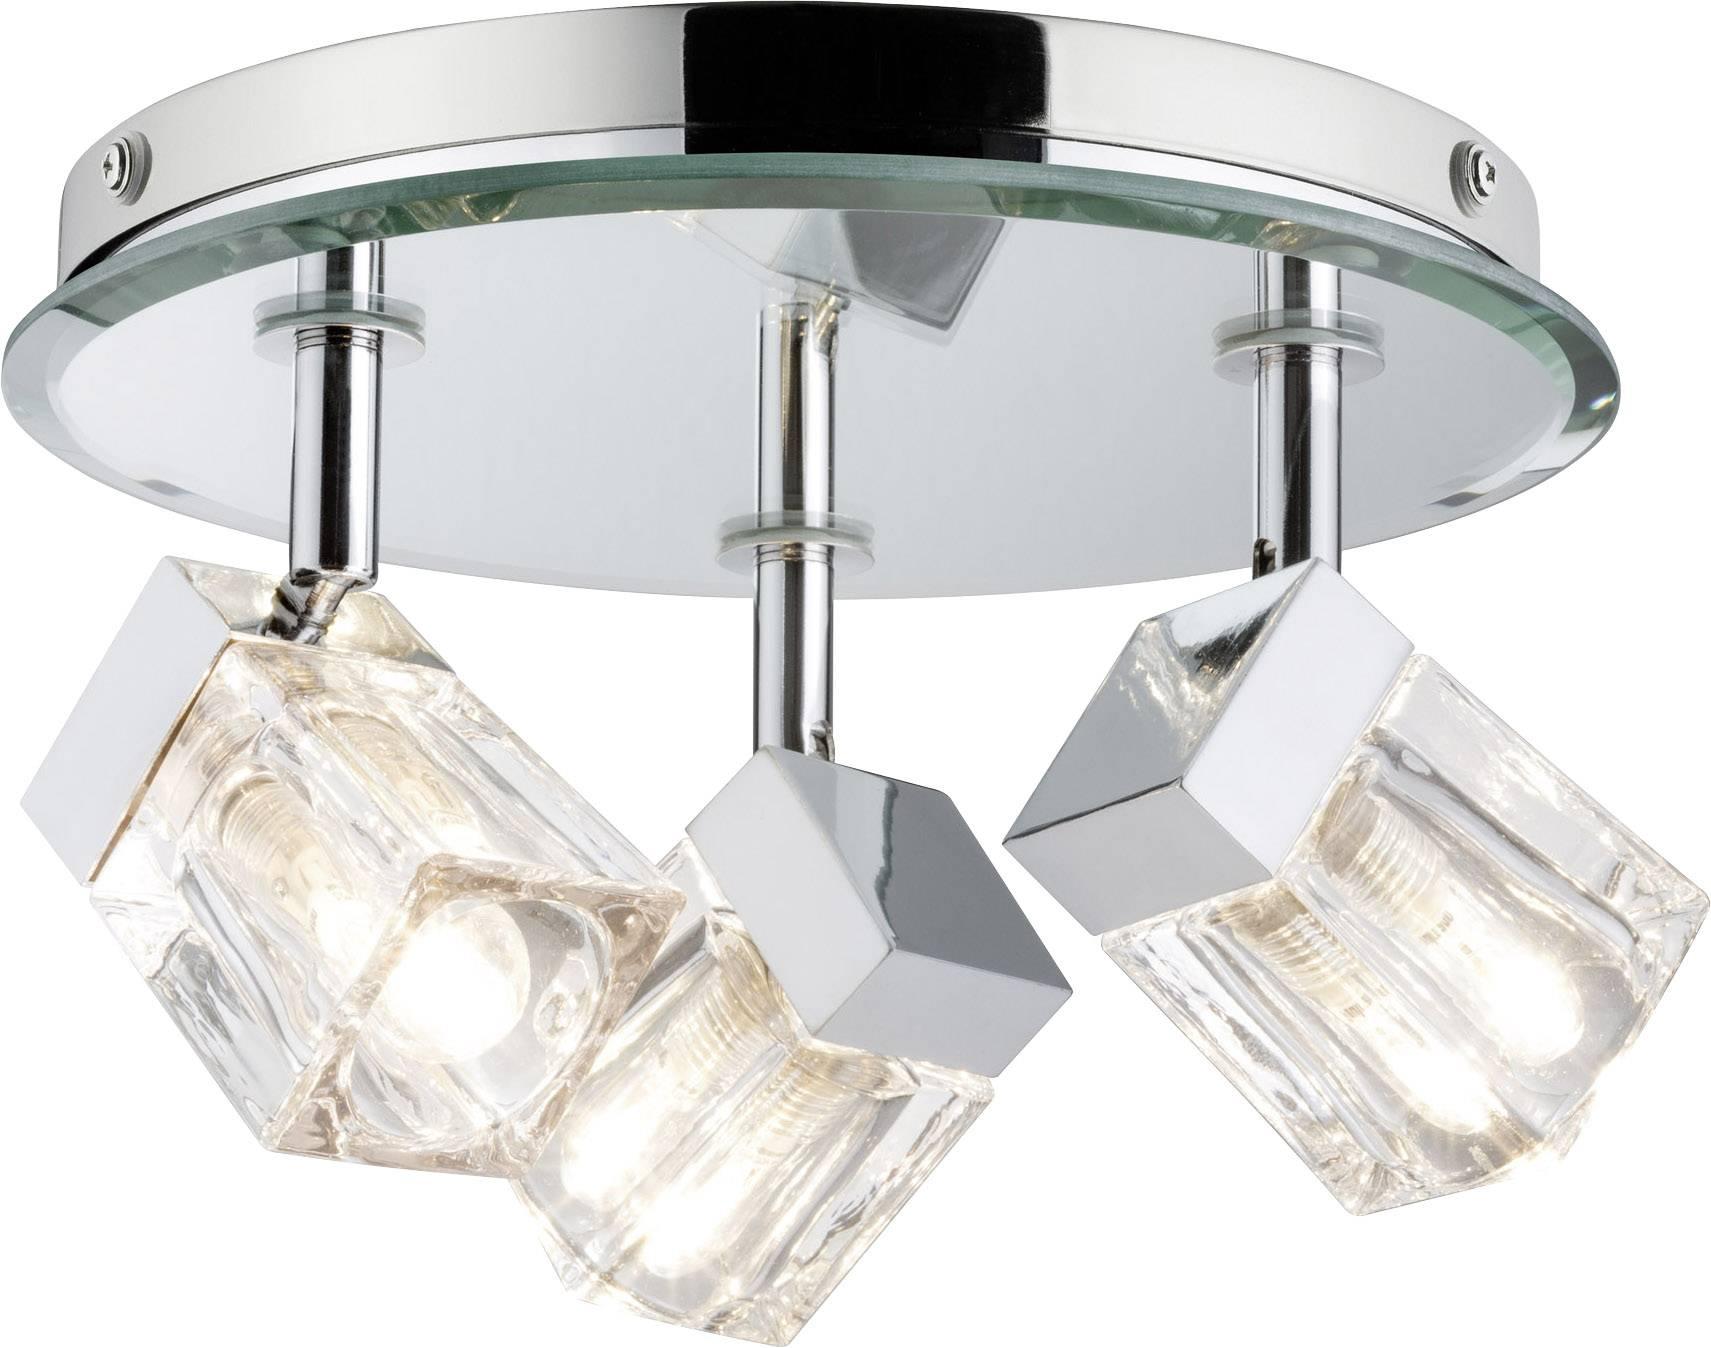 Badkamer Plafondlamp Led : ▷ badkamer spots led kopen online internetwinkel